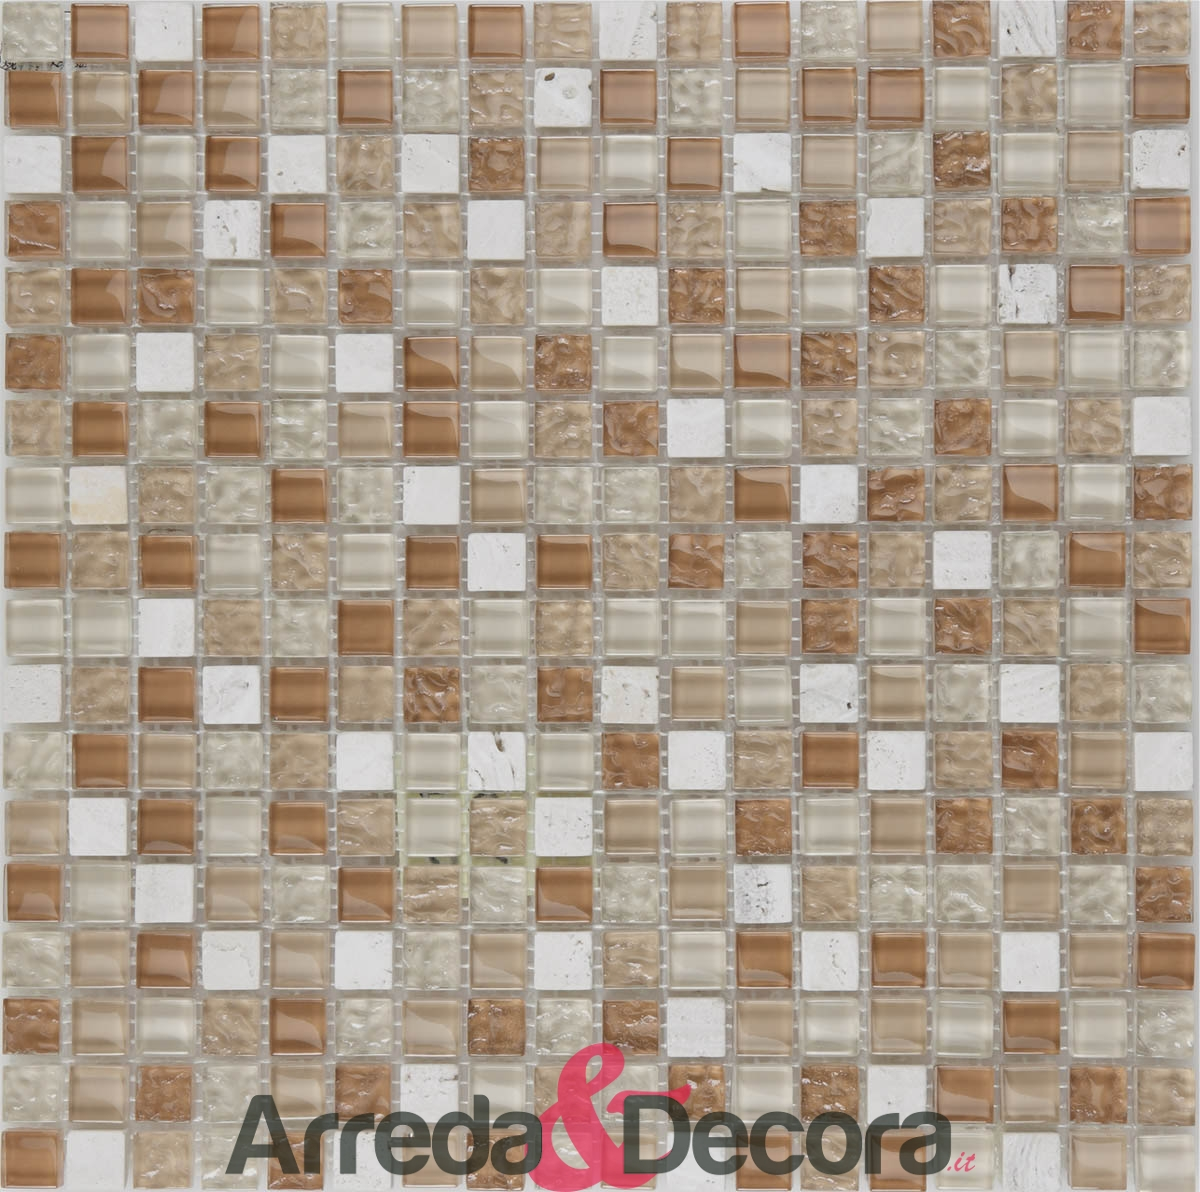 mosaico beige chiaro